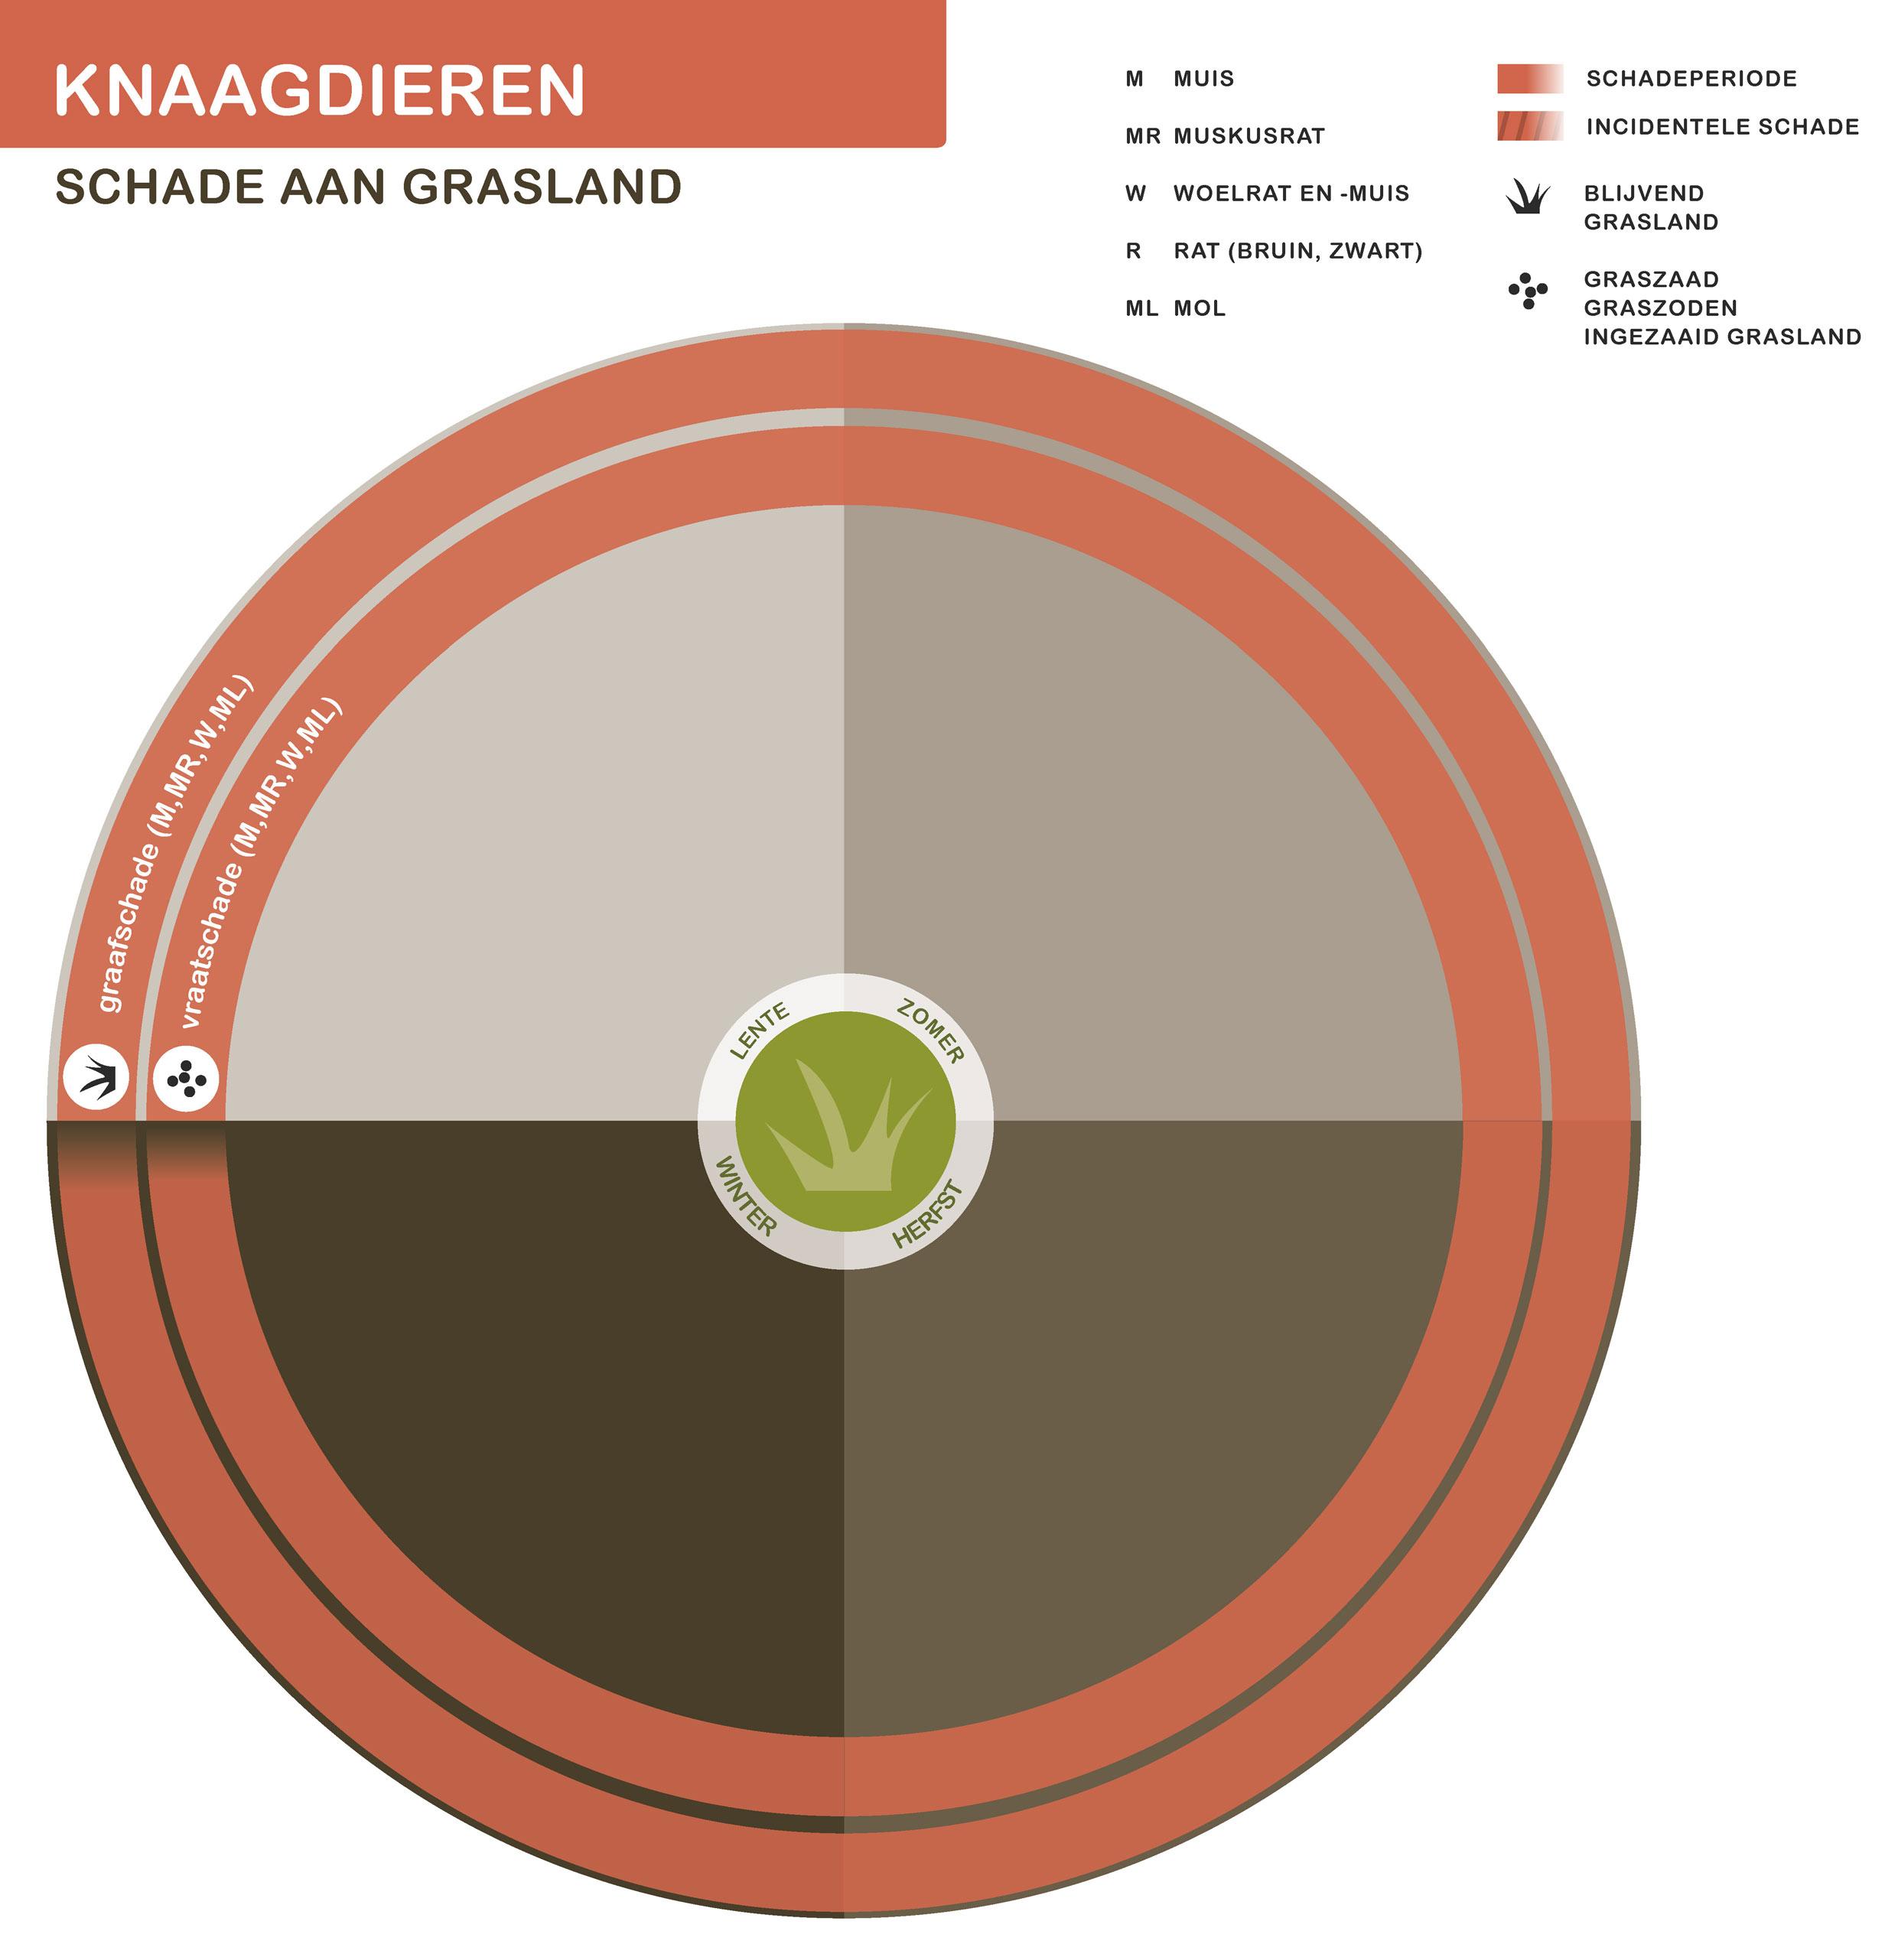 FPK-infogr-knaagd-grasland-1